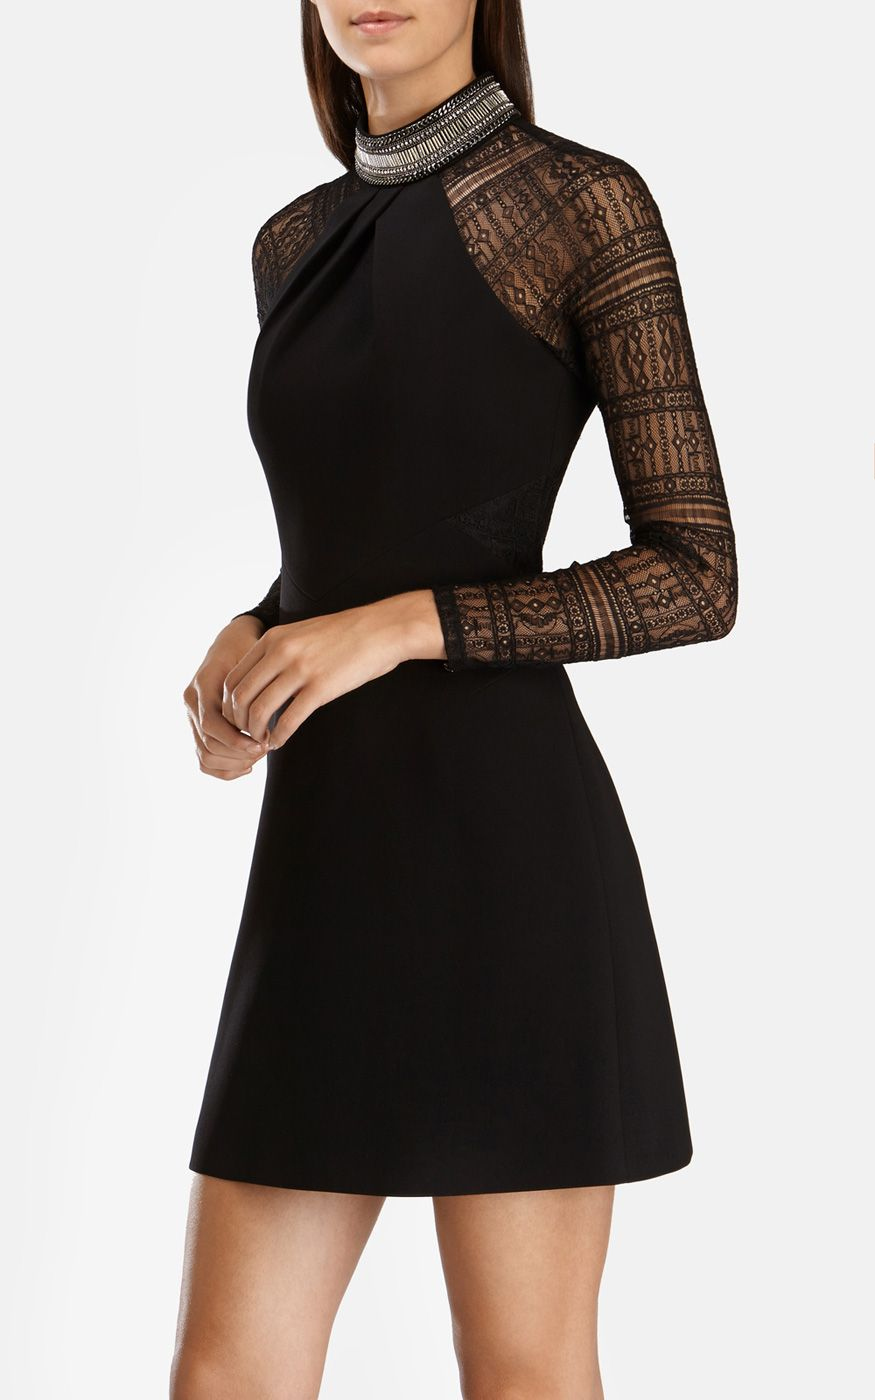 171216b3 Karen Millen DIAMANTE NECKLINE DRESS WITH LACE SLEEVE. For statement  evening style, look no